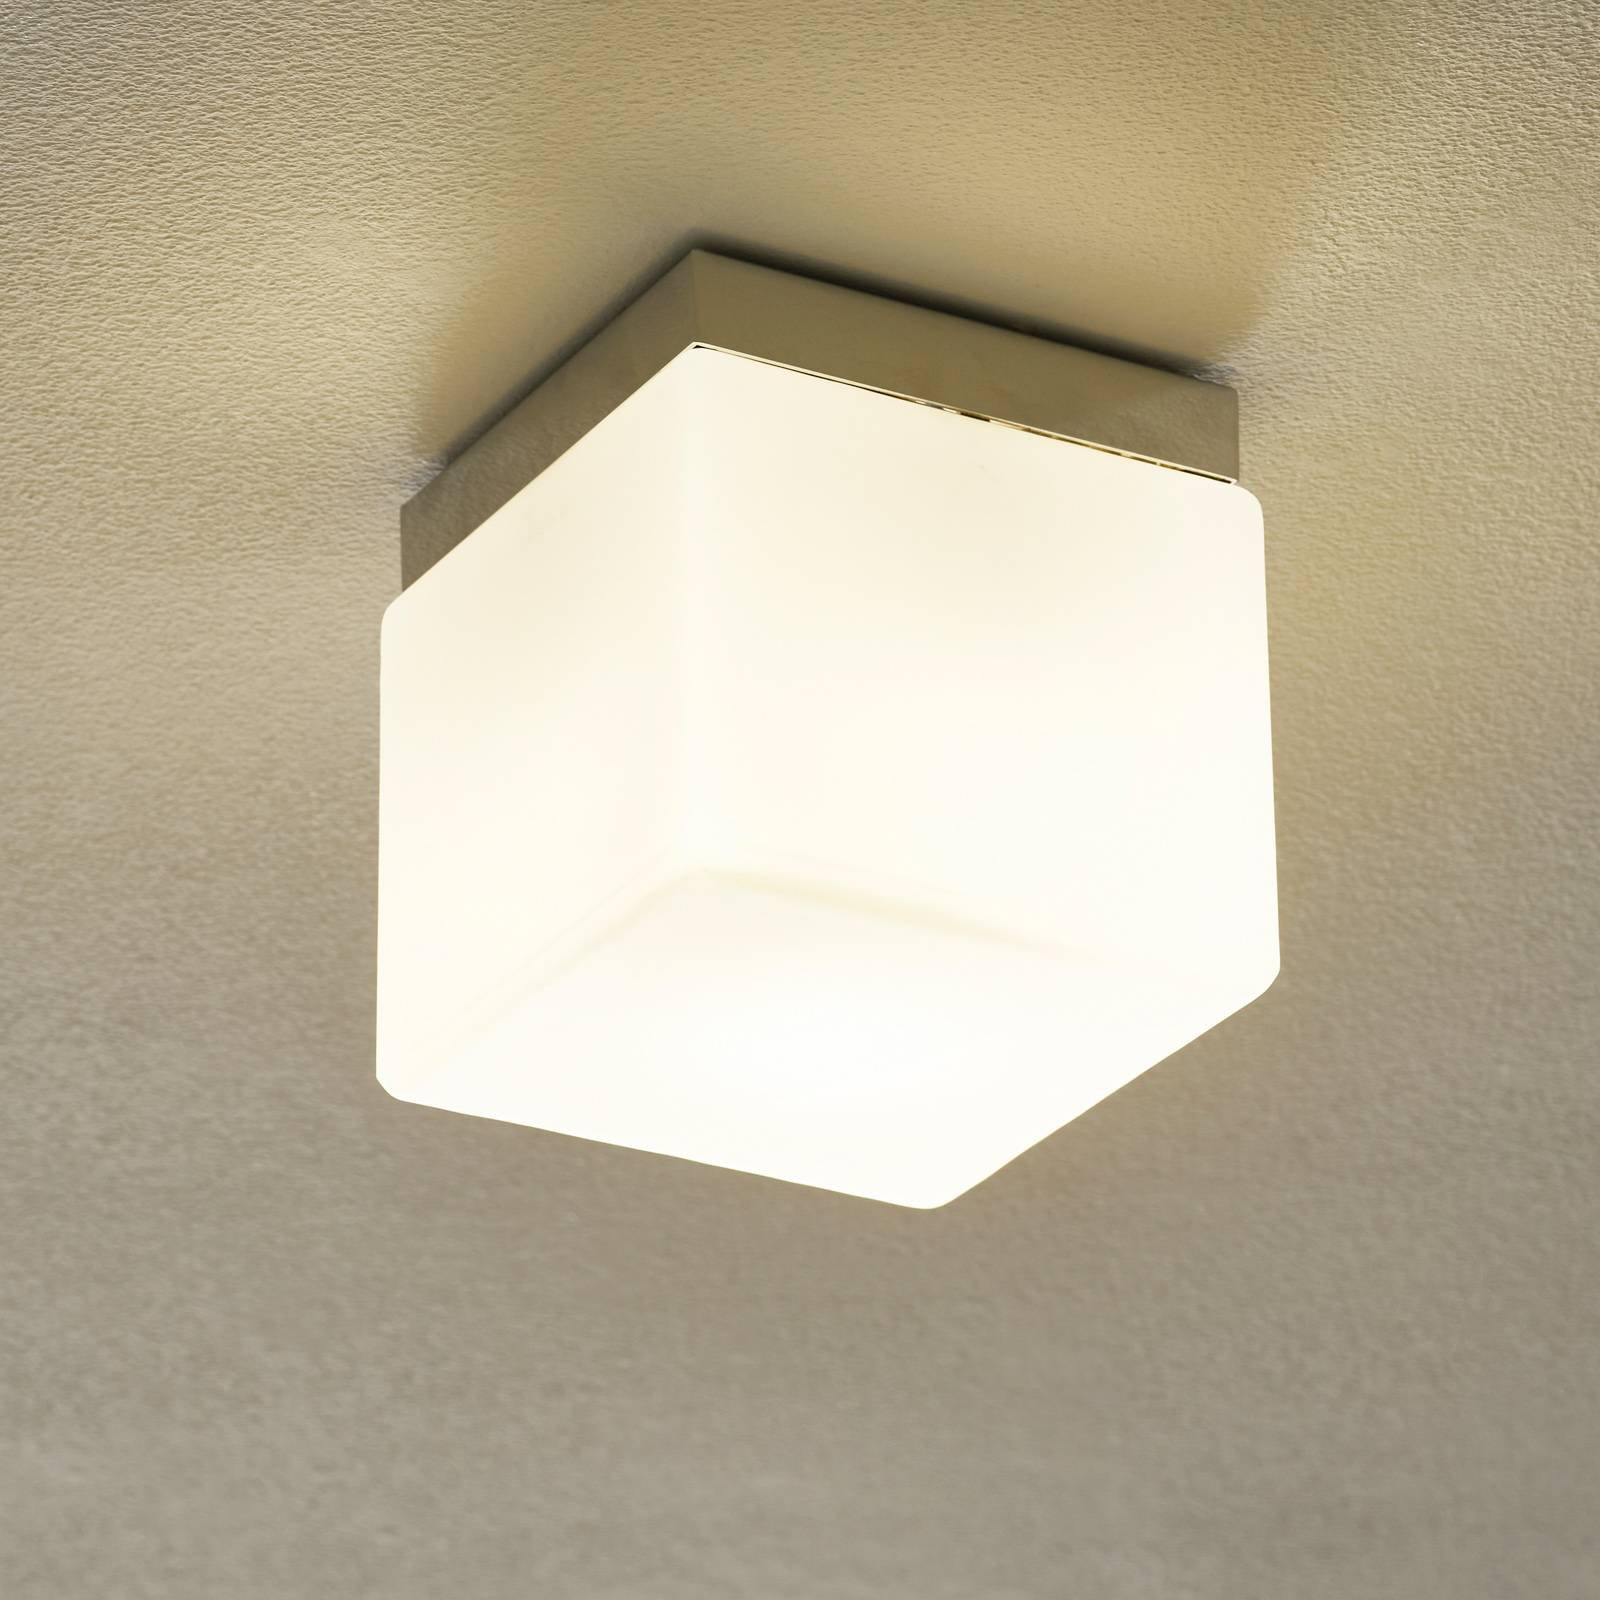 Cubis bordlampe i krom